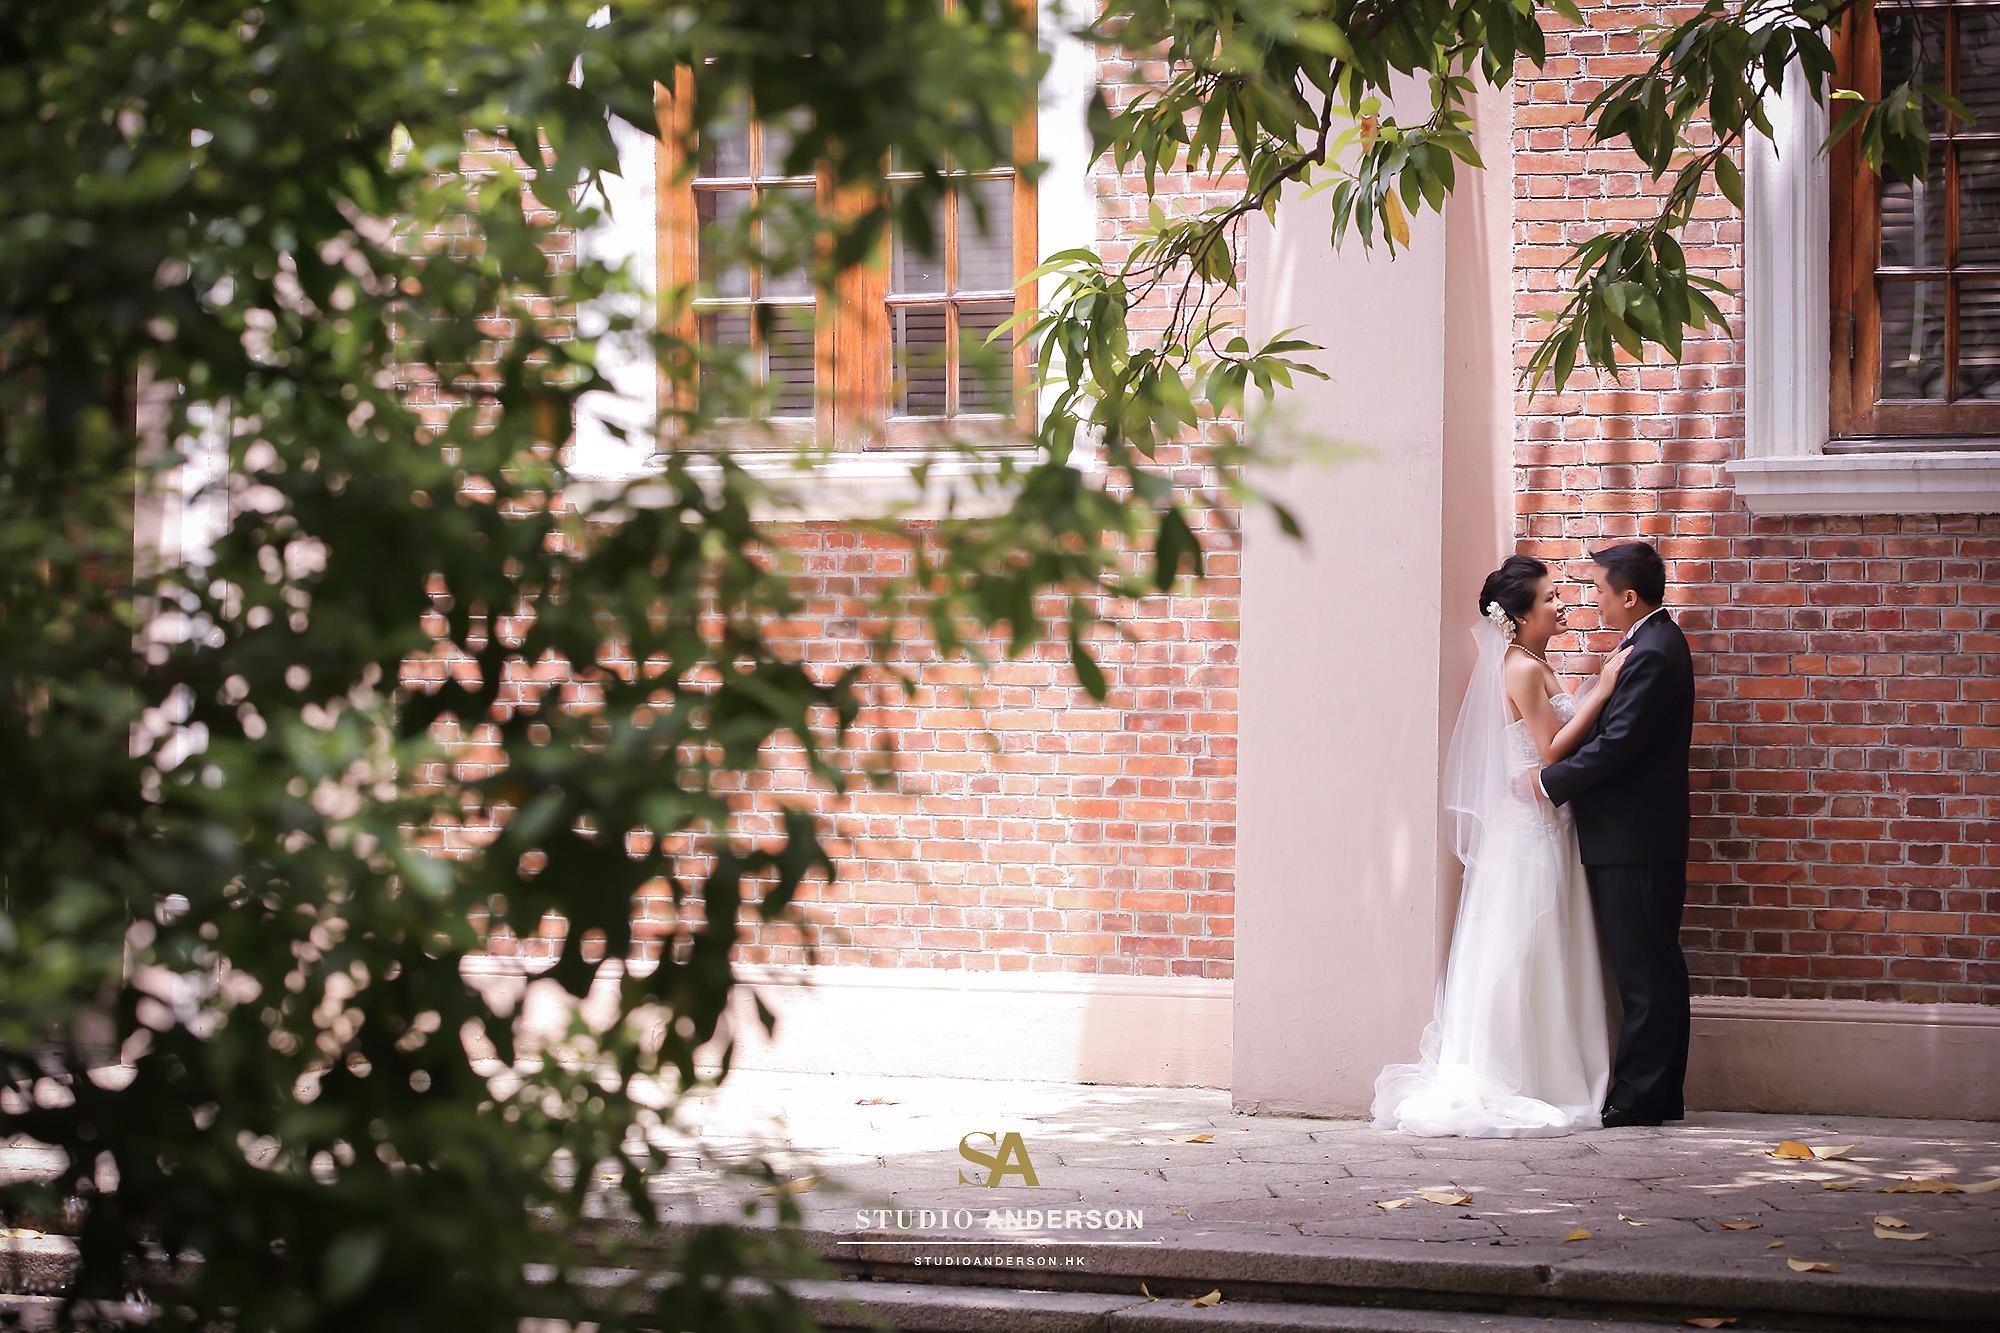 043 - Mandy and Joe Engagement (Watermark).jpg